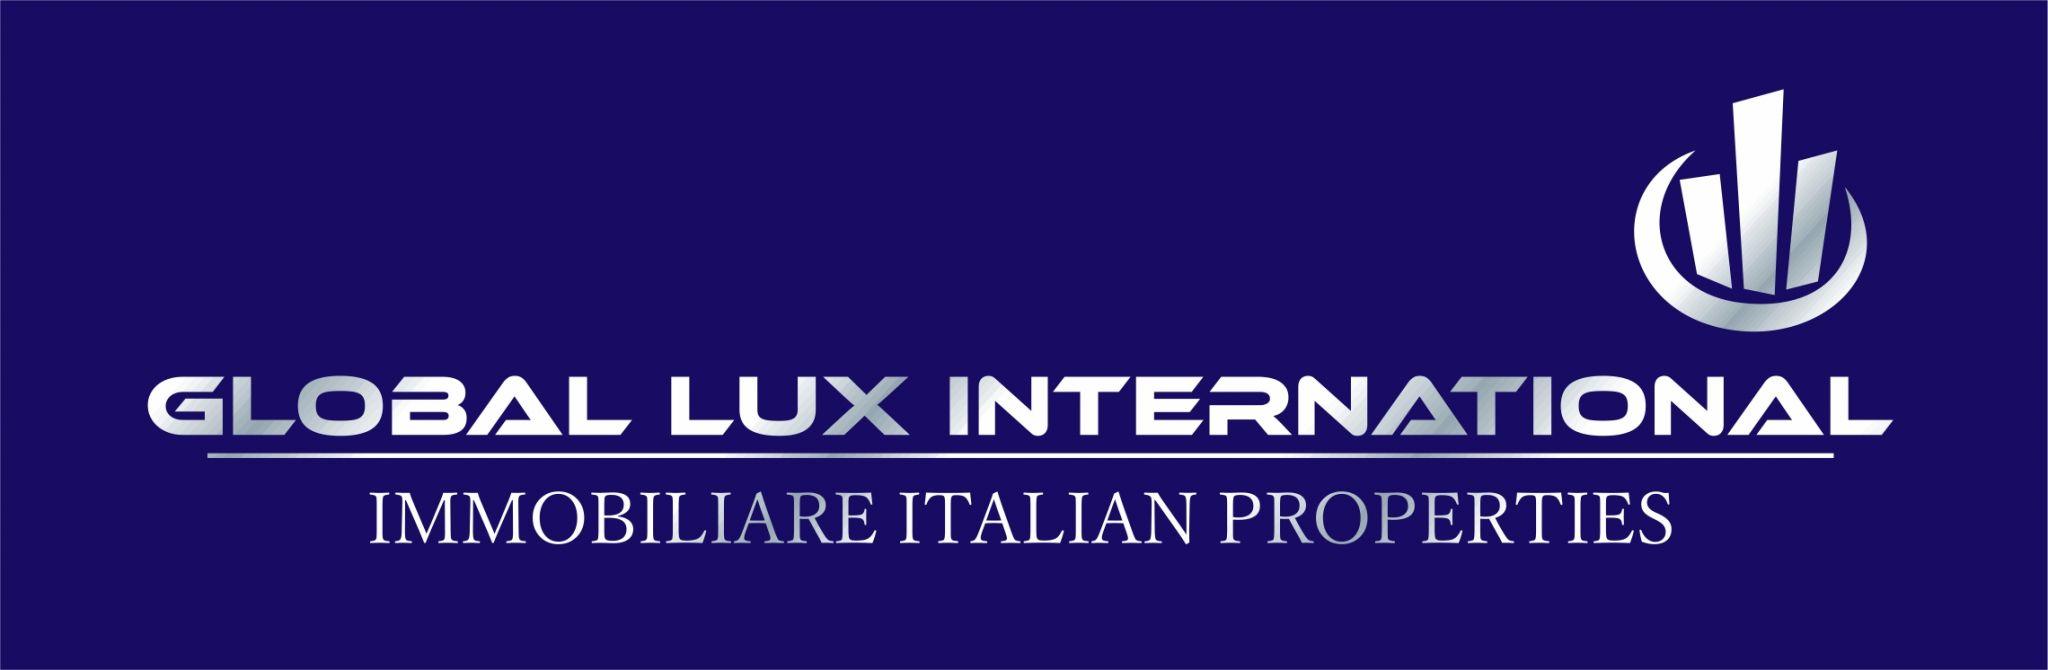 Global Lux International Immobiliare Italian Properties